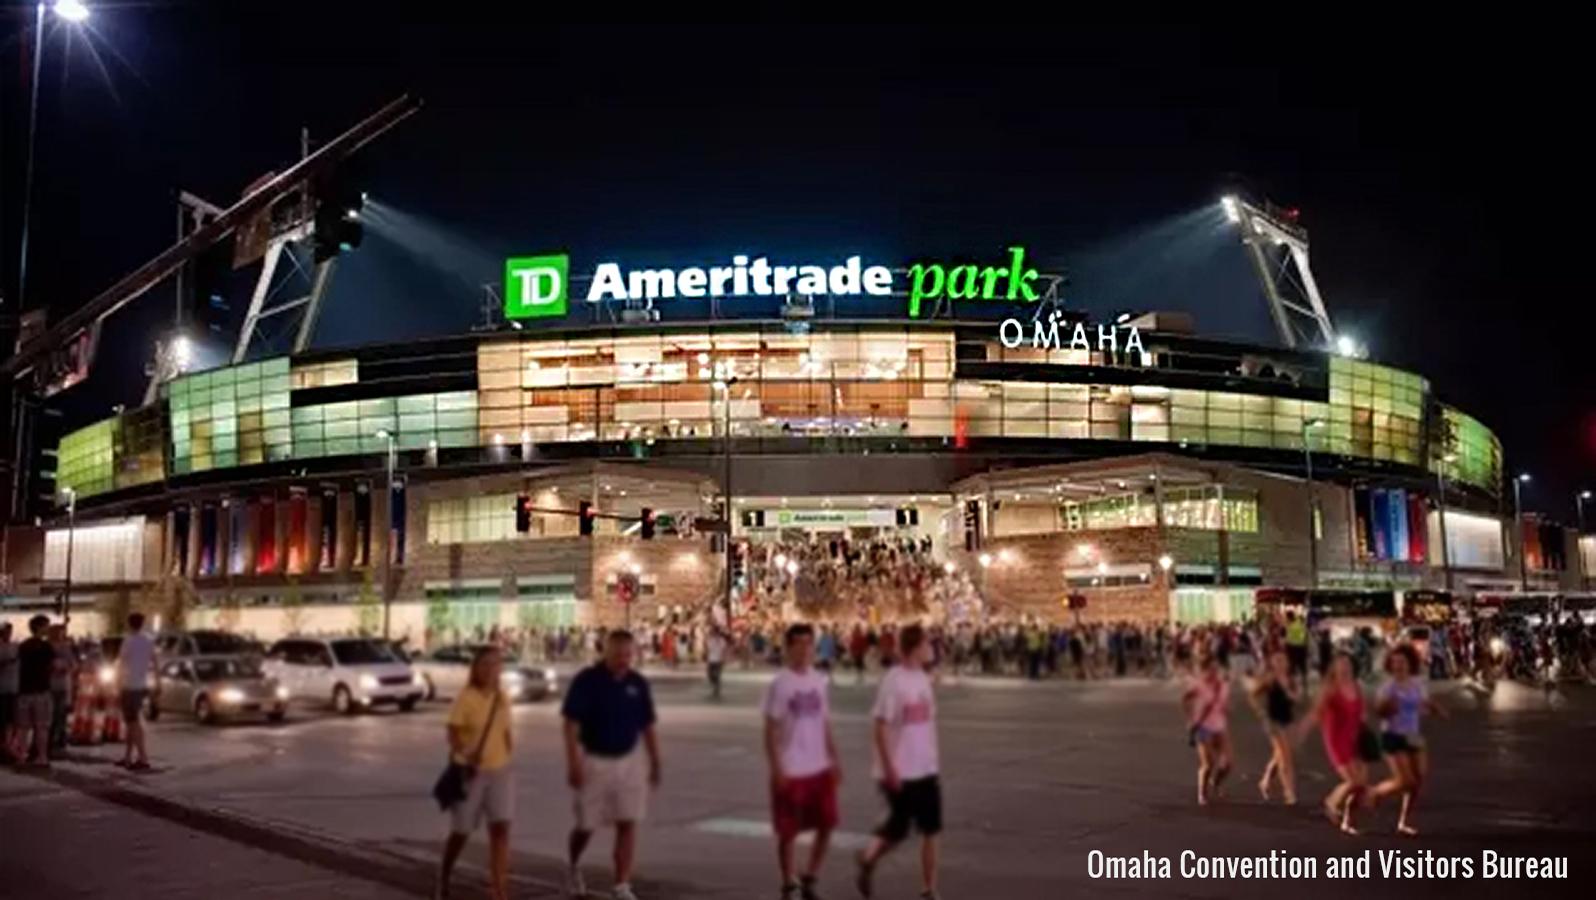 exterior of the Ameritrade baseball Park in Omaha